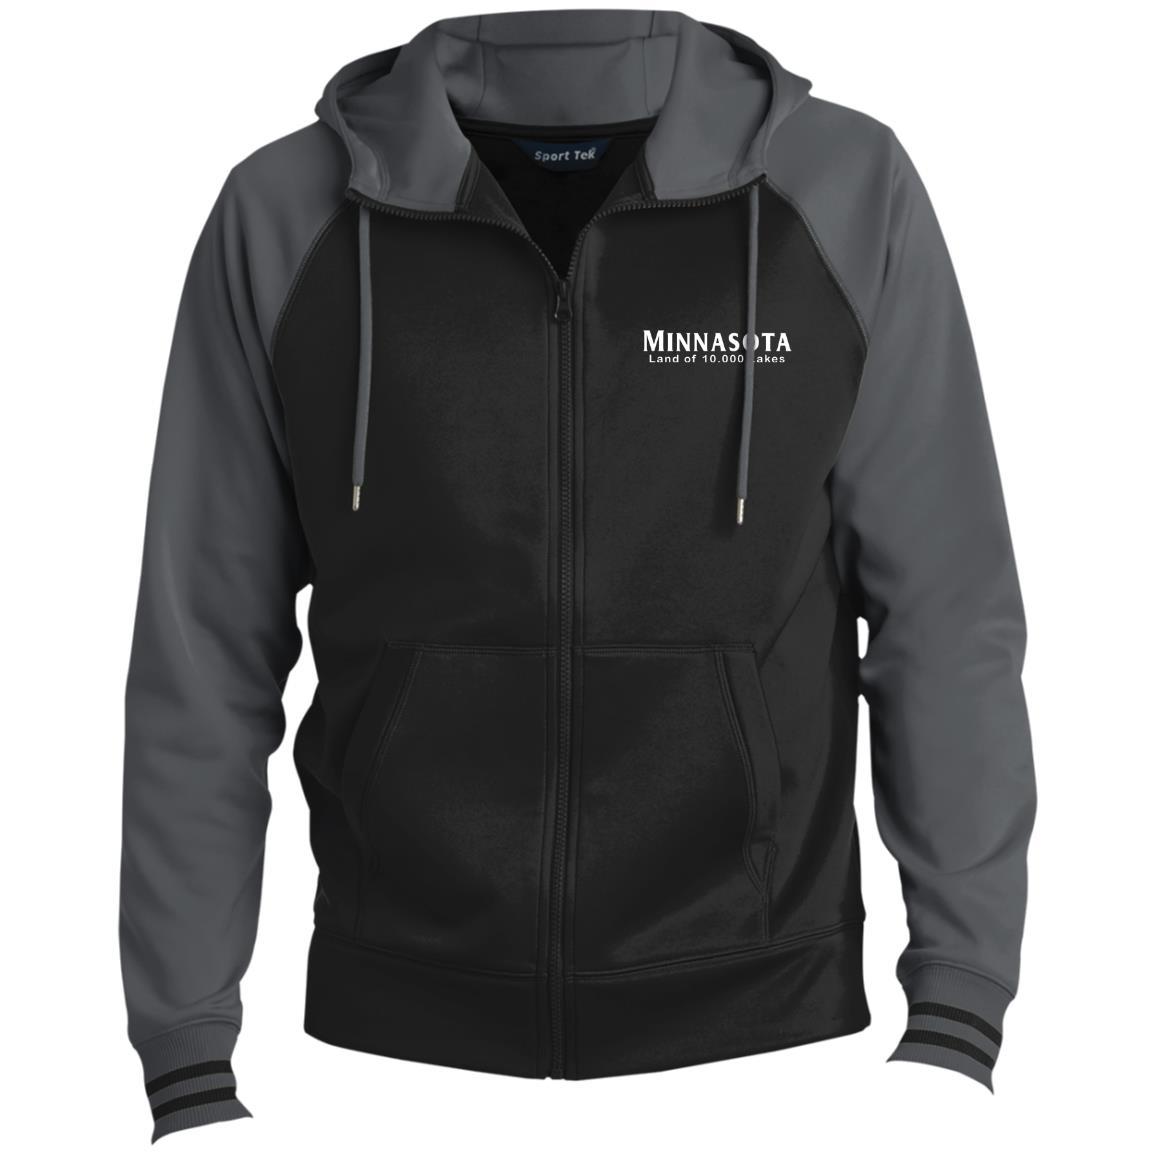 Minnasota Land of 10,000 Lakes Men's Sport-Wick® Full-Zip Hooded Jacket